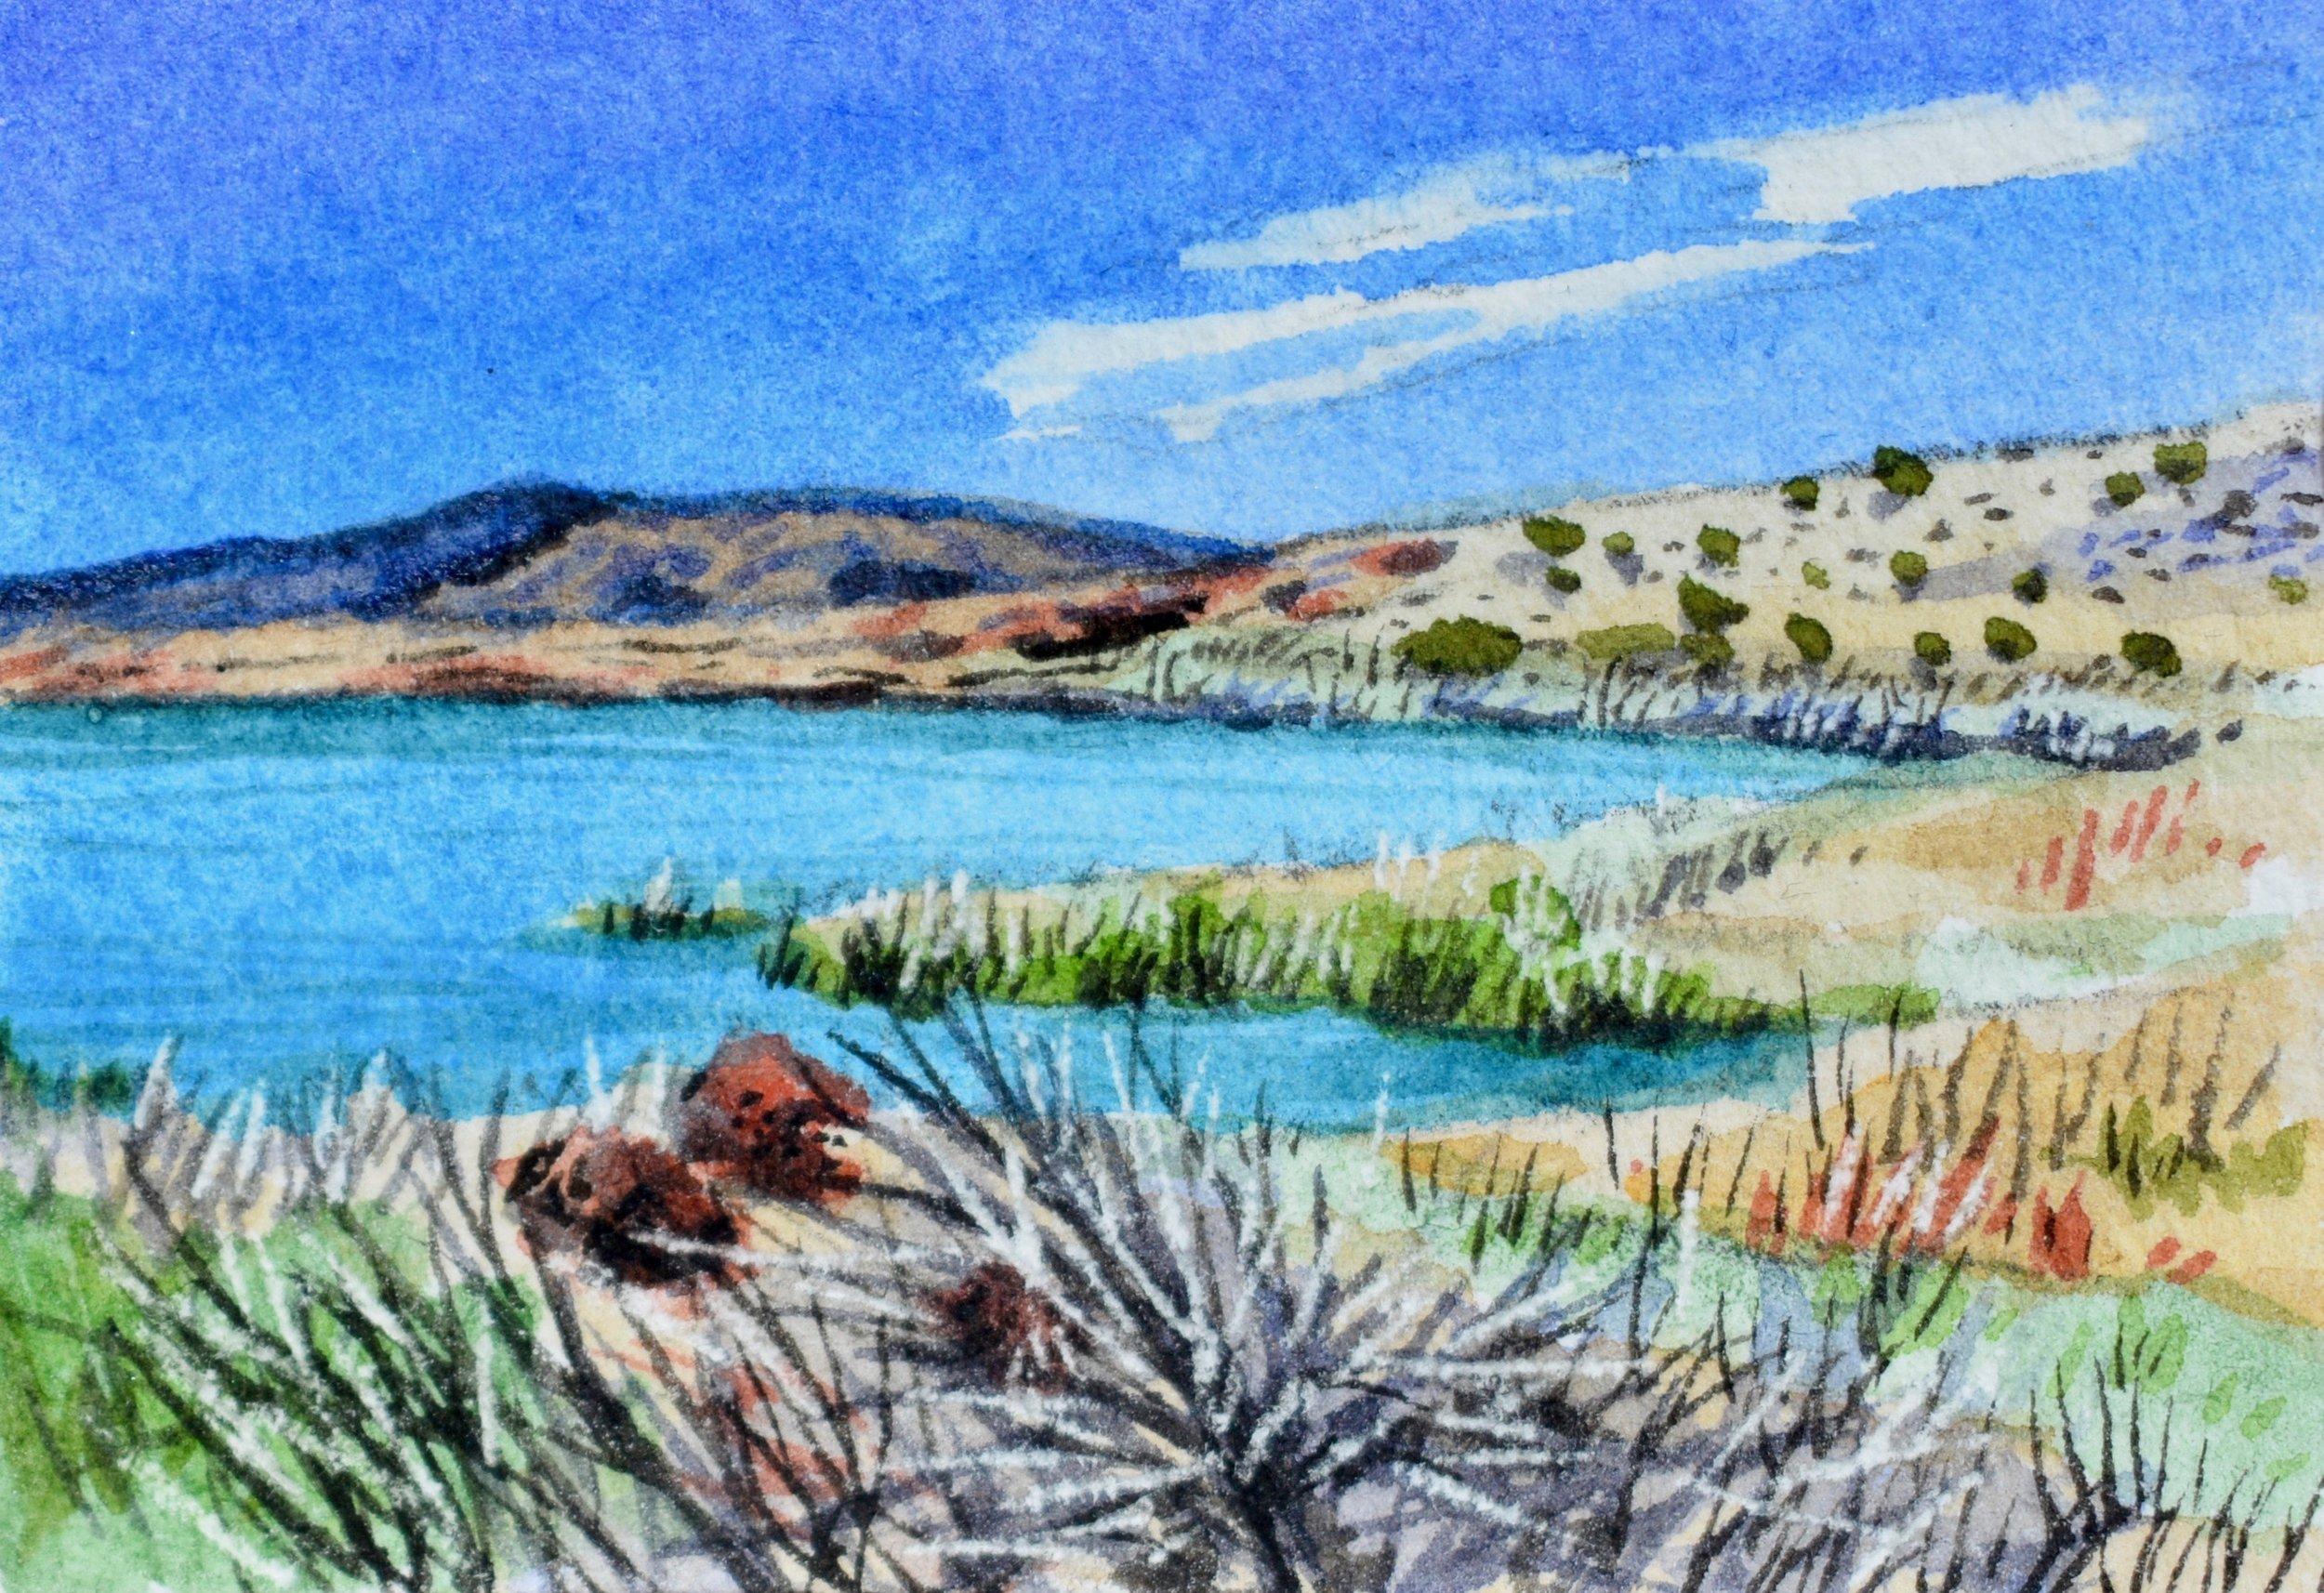 """Havasu National Wildlife Refuge, Arizona: 3/3/19, 12:26:27""  For sale as of this blog posting  3x2"""